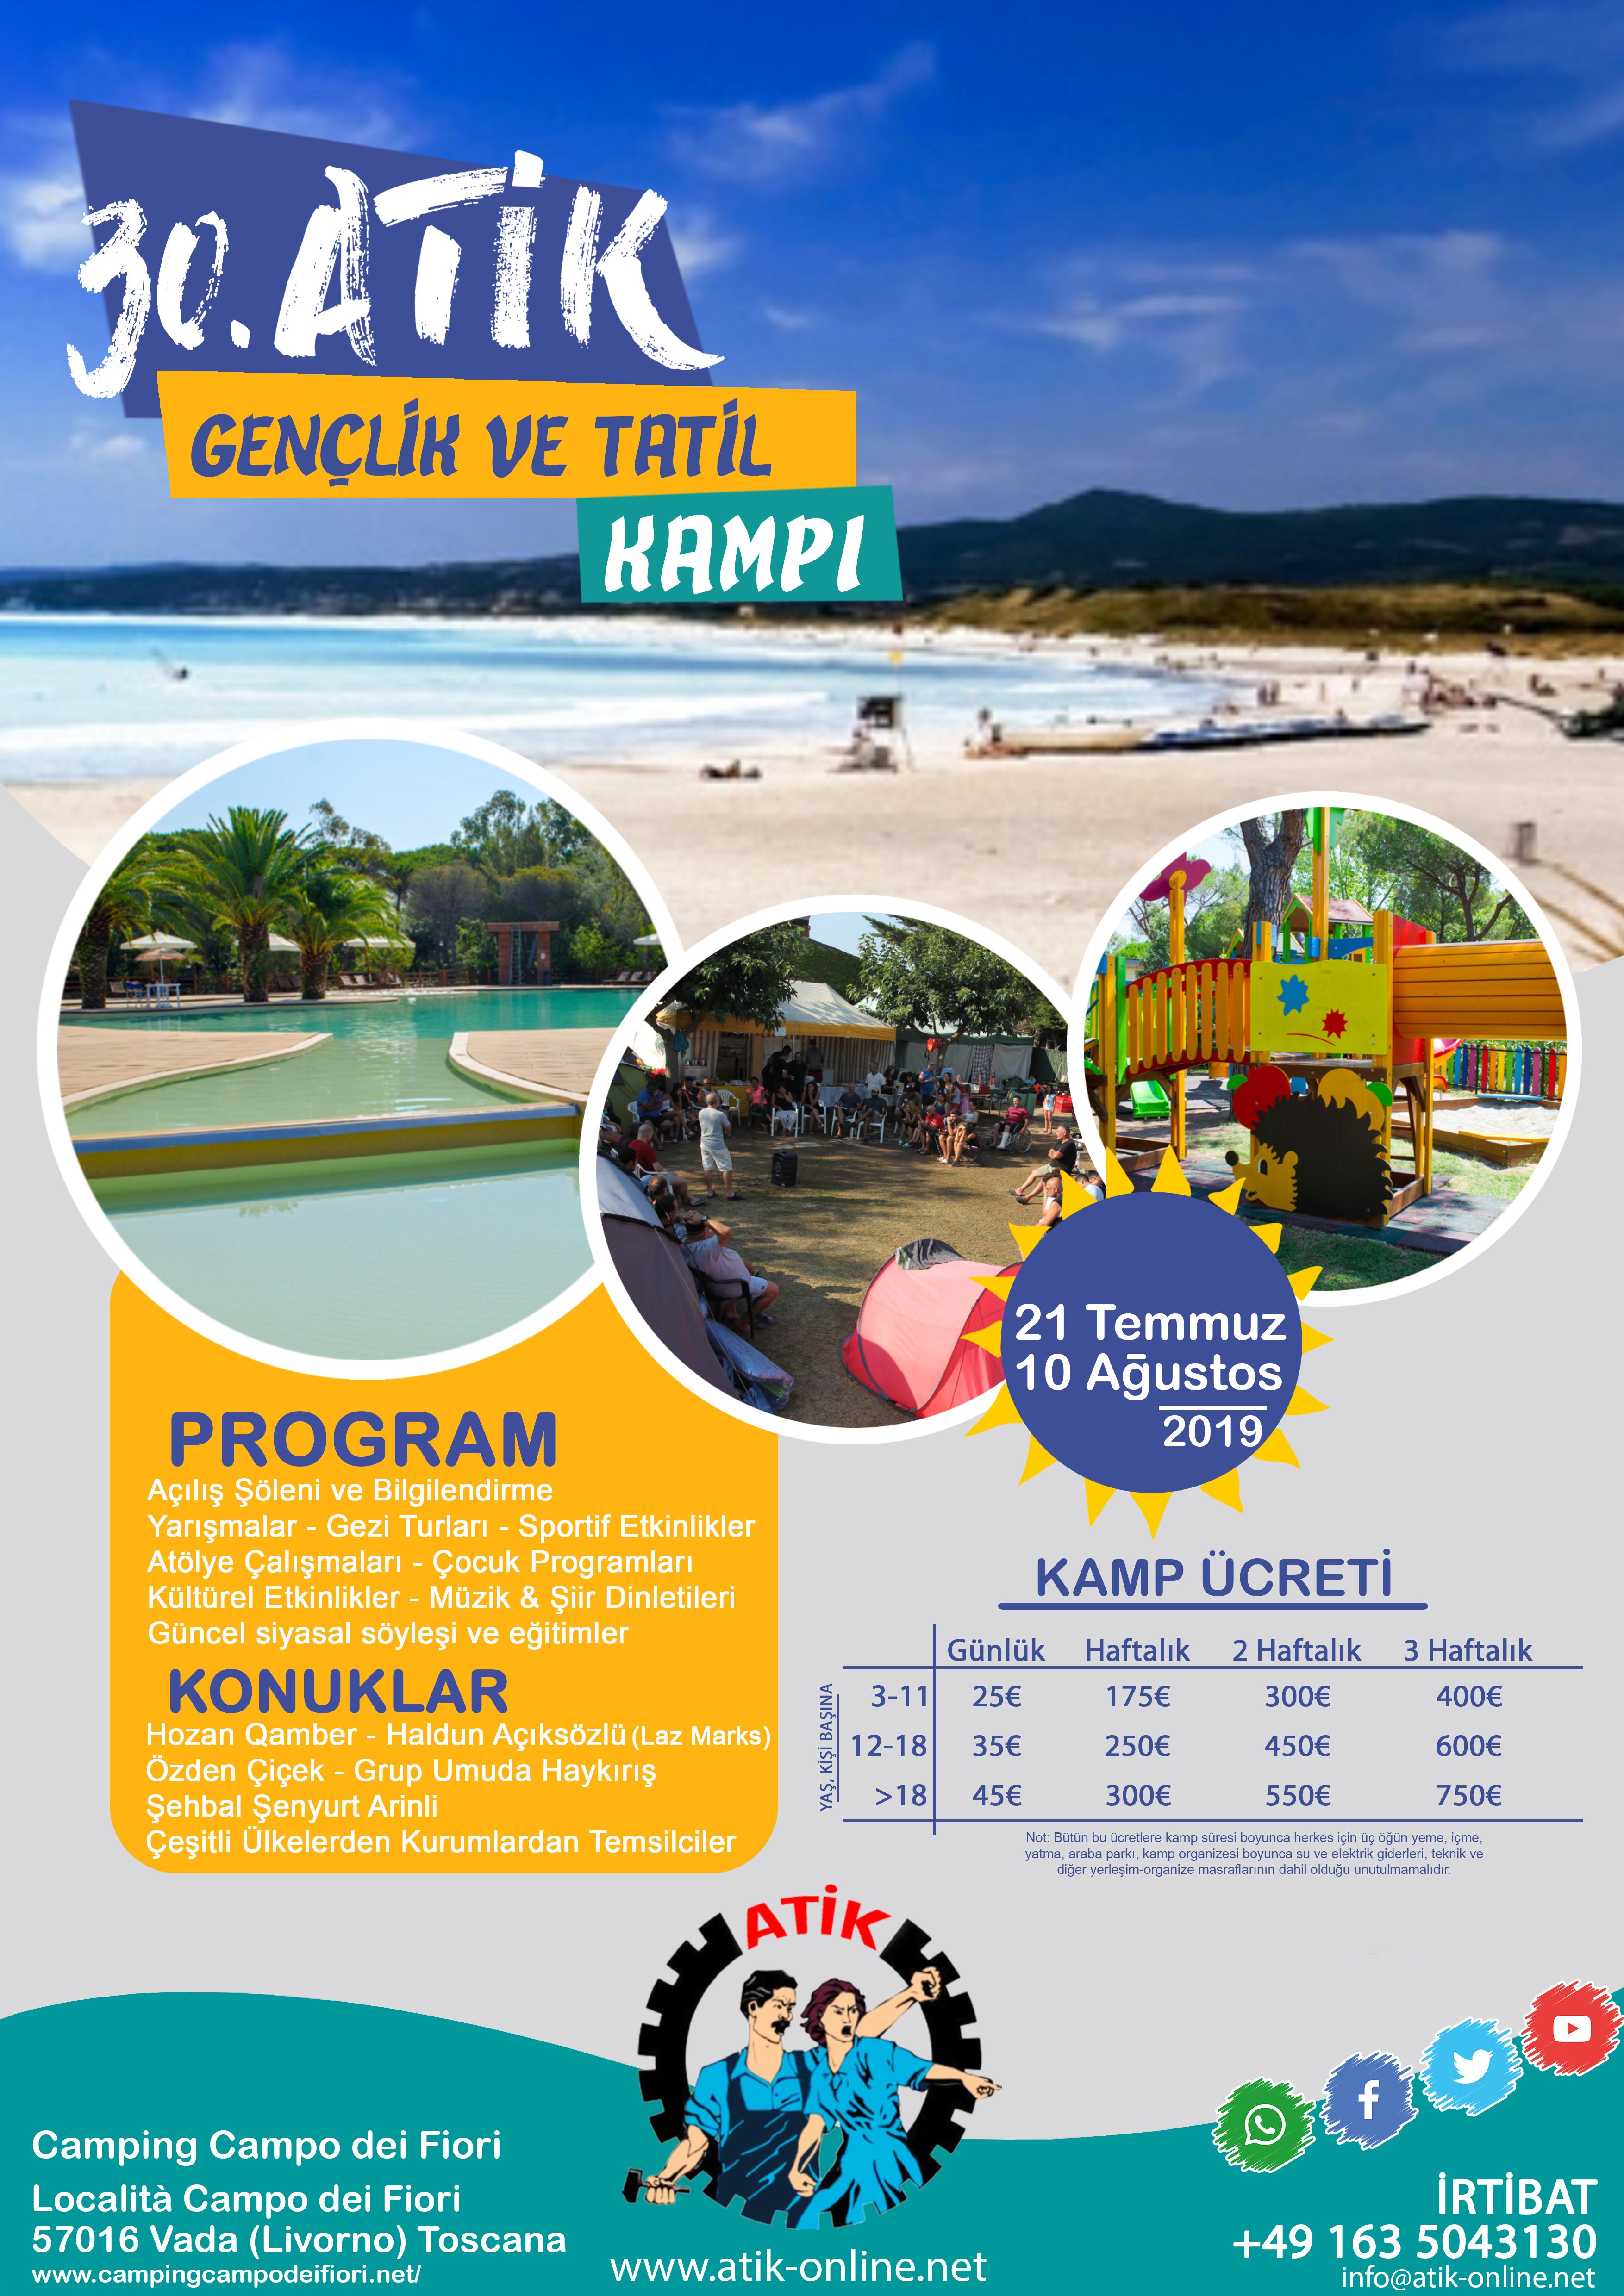 ATİK Gençlik ve Tatil Kampı 2019